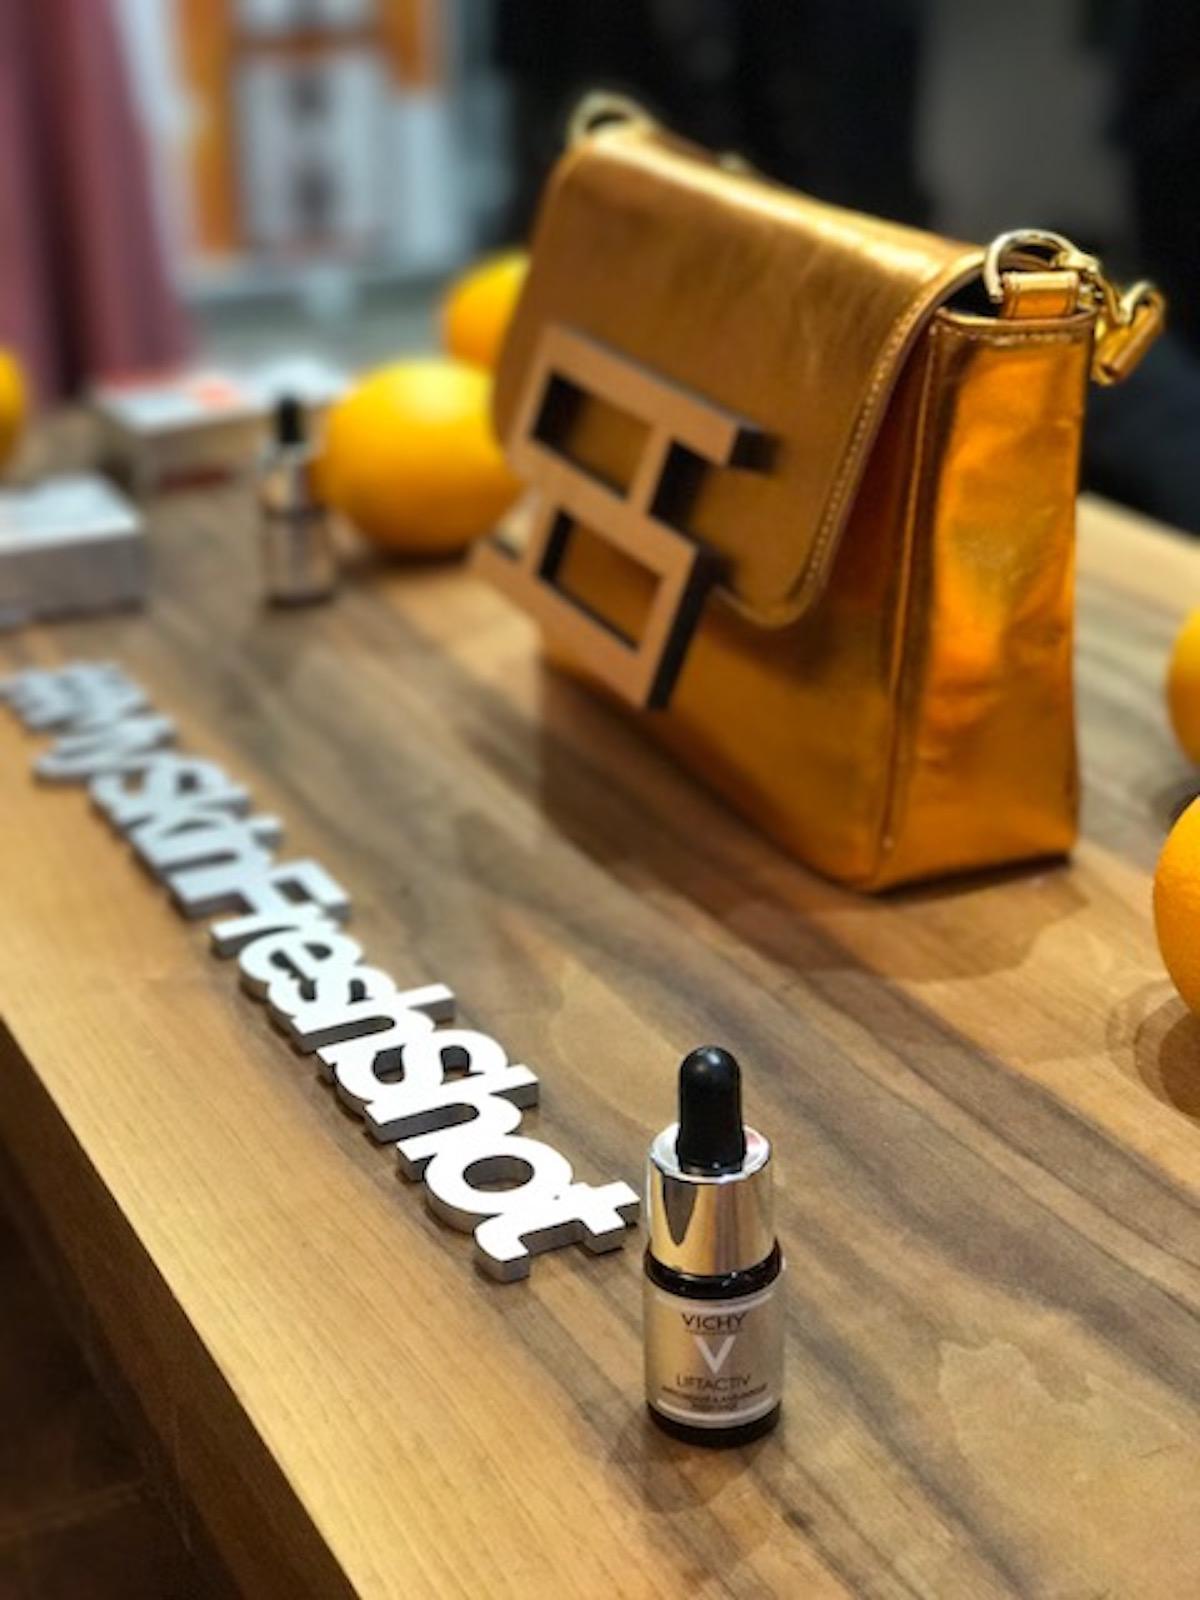 Susnyara Vichy vitamin C Liftactiv Fresh Beautyfullblog